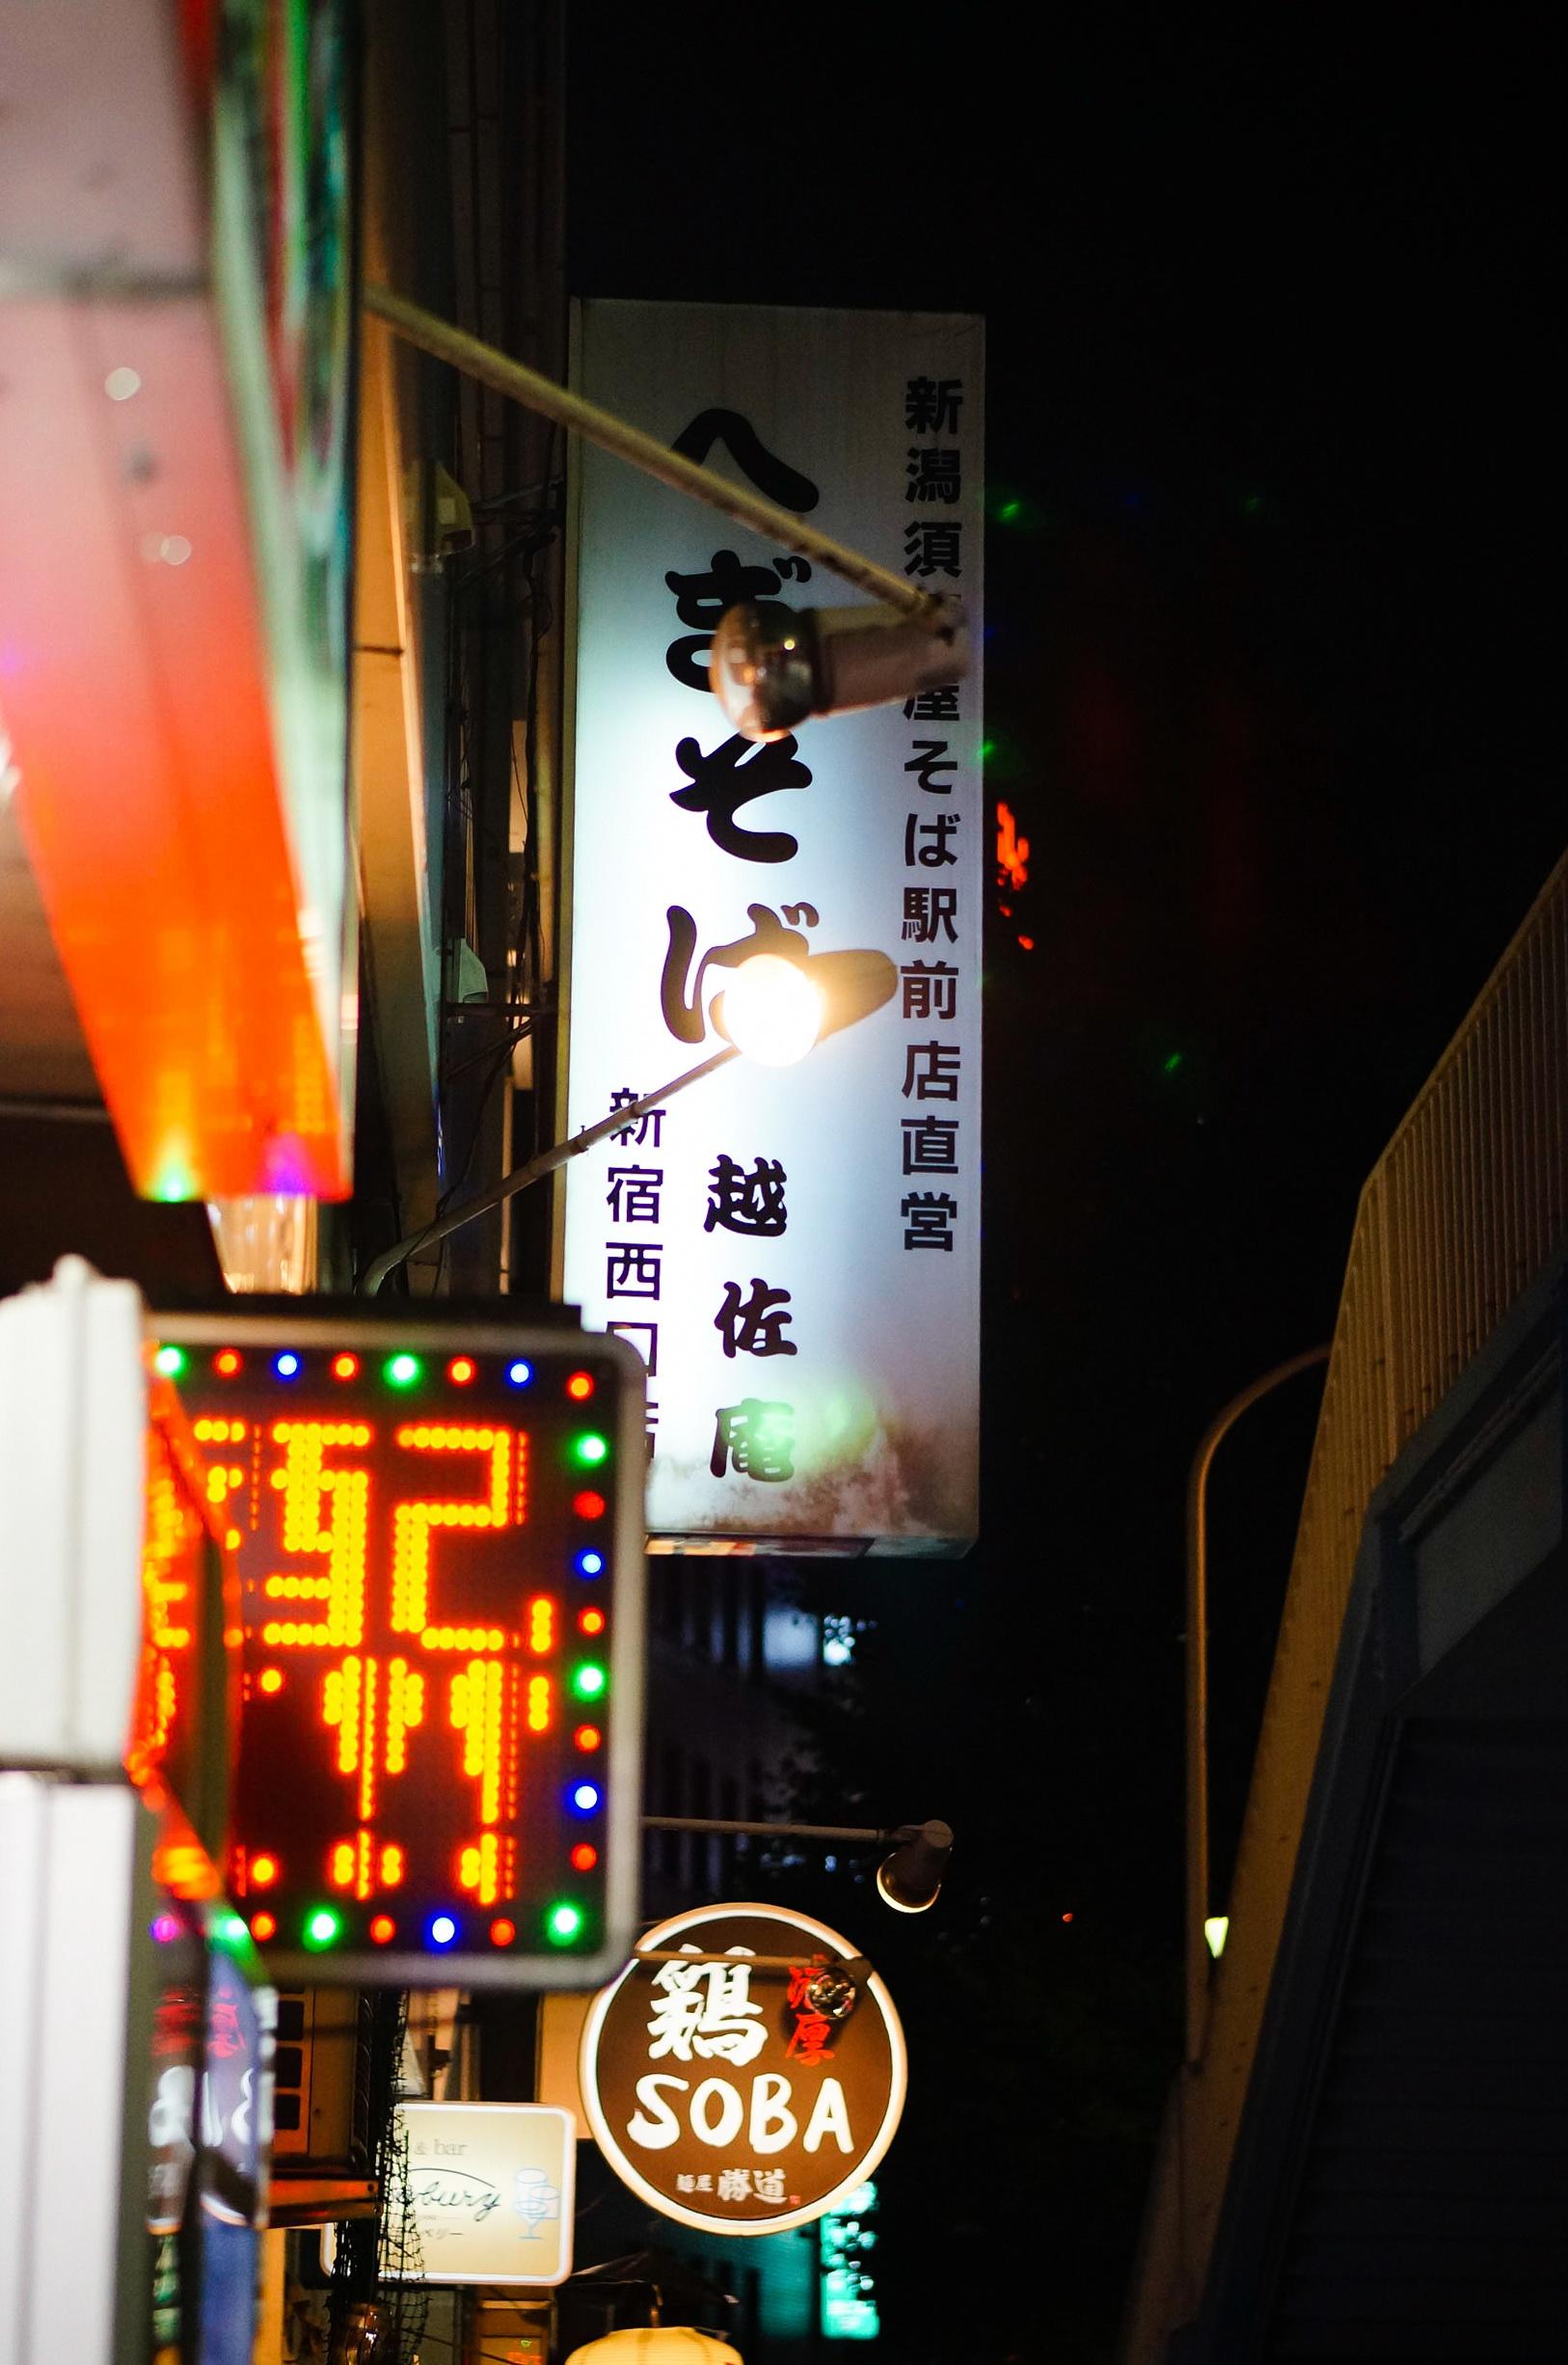 shinjuku, tokyo, tokyo by night, neon city, japon, japan, voyage au japon, japan trip